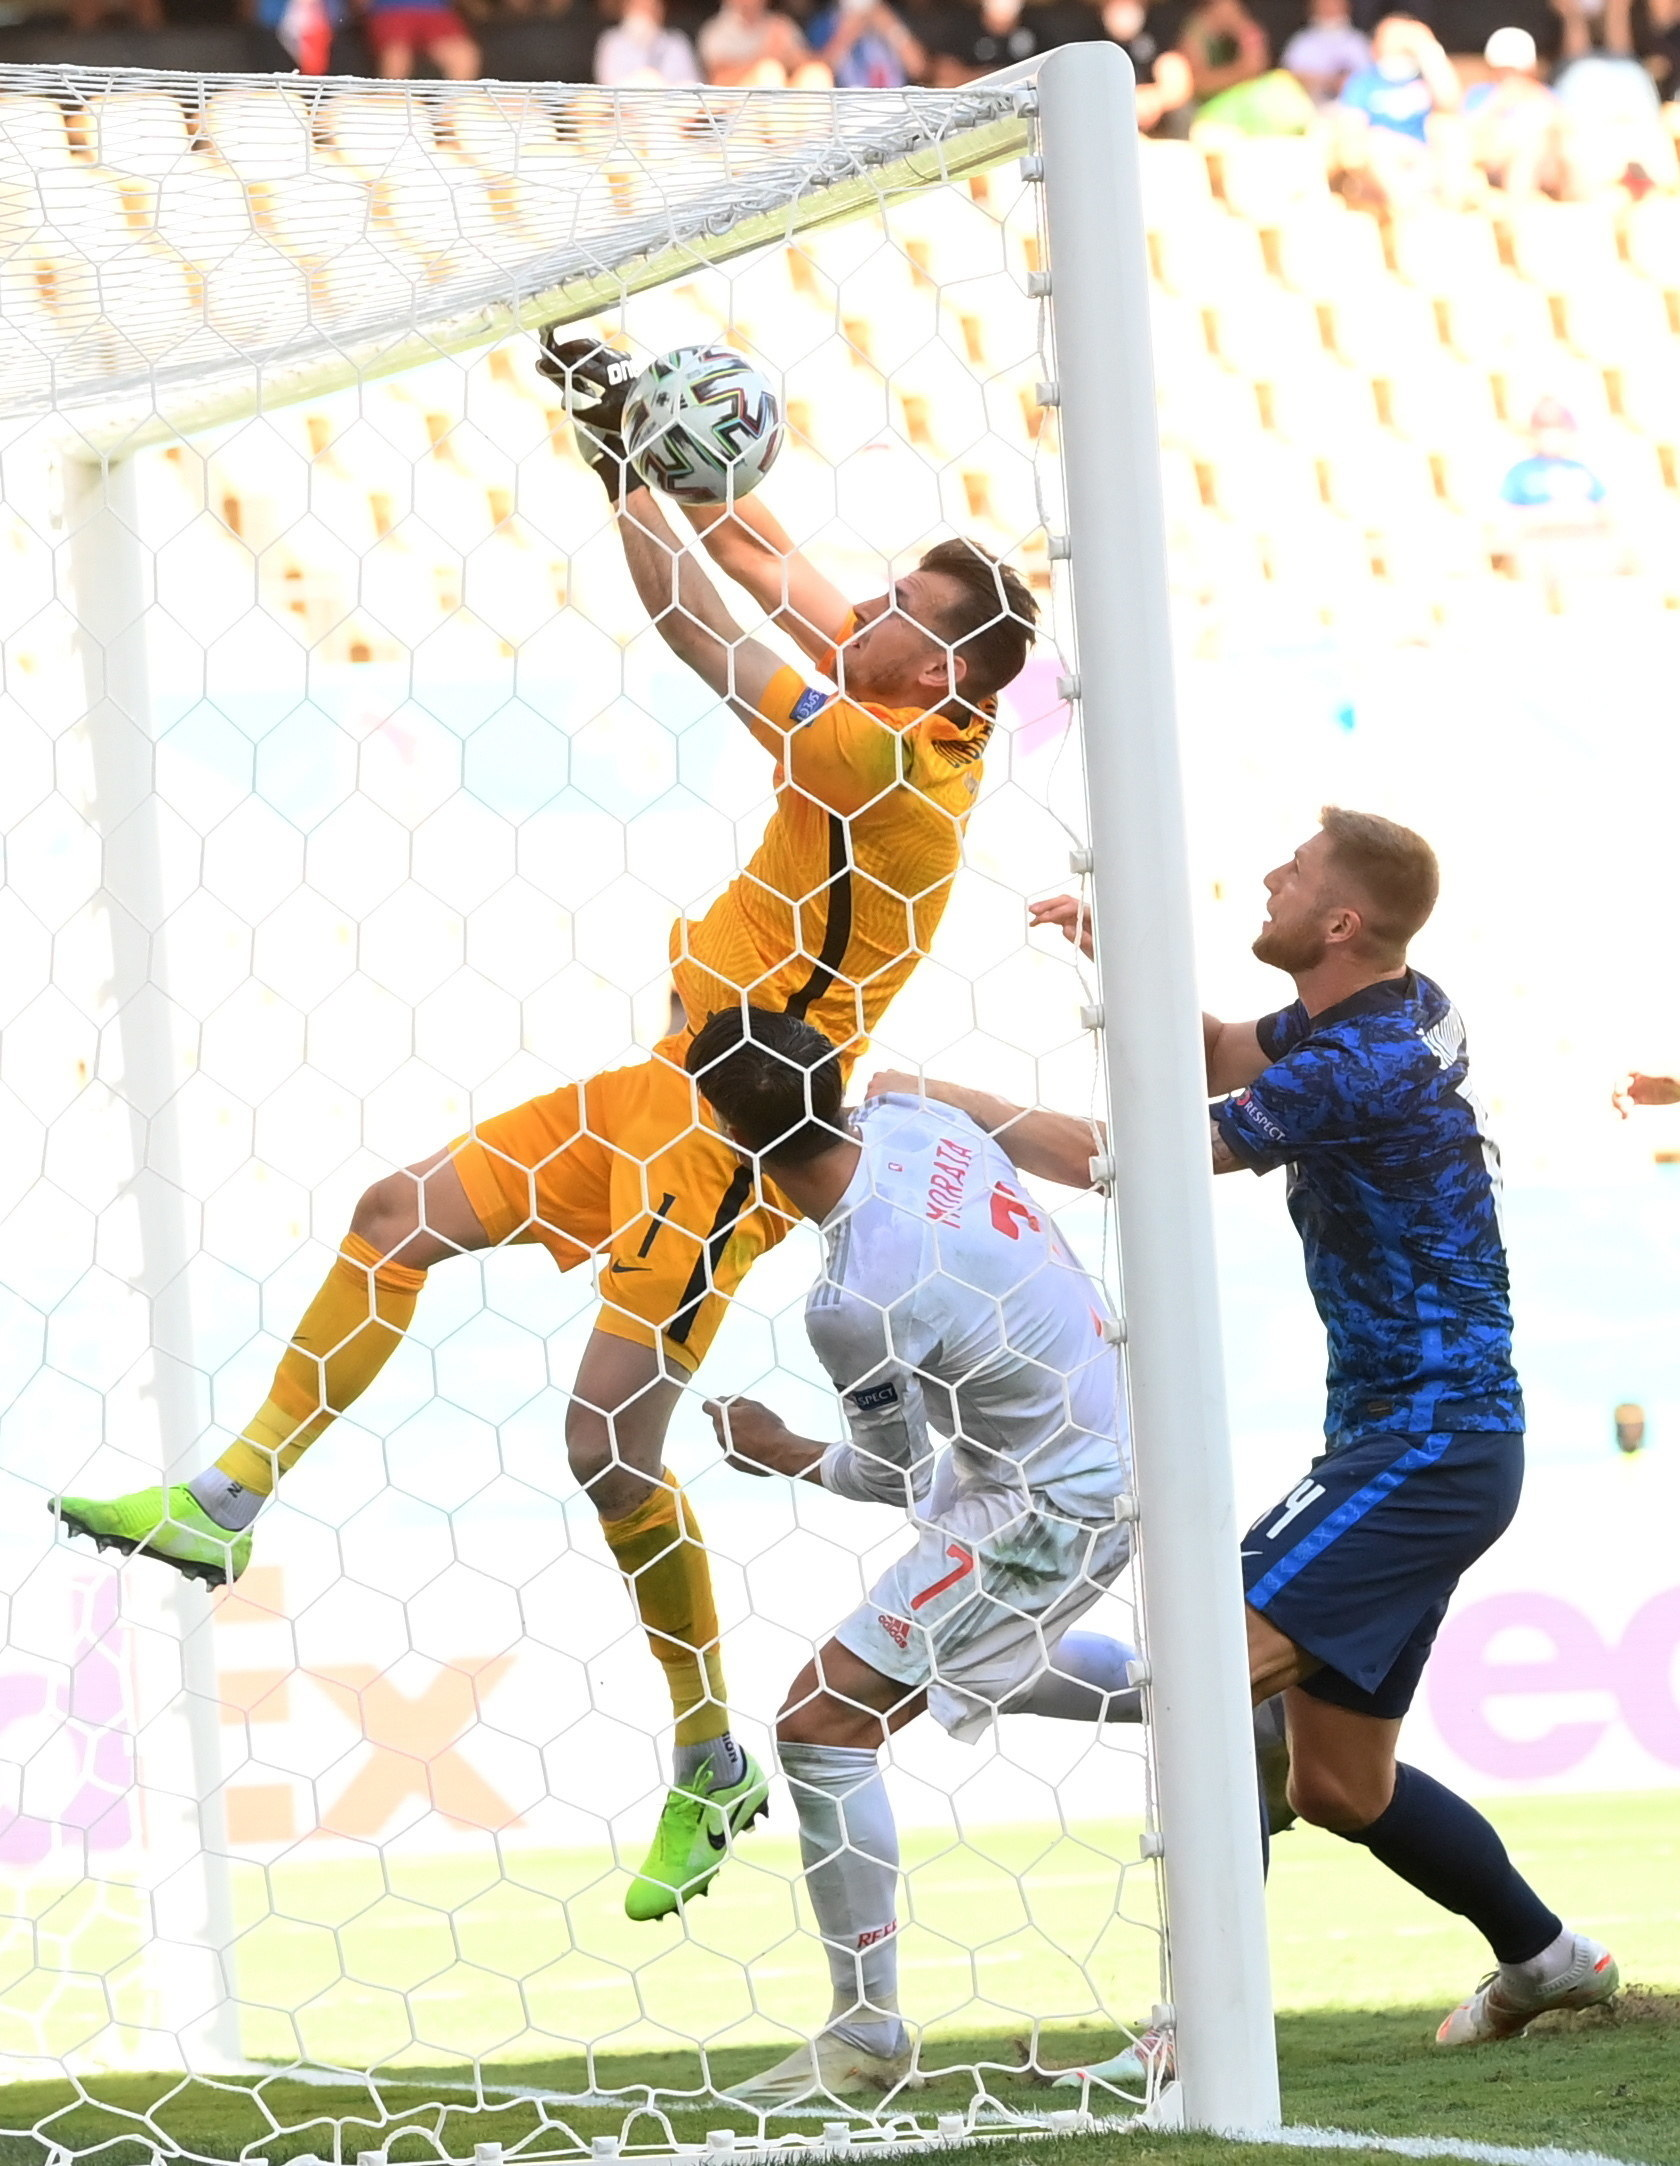 Dubravka anota en propia el primer gol de España.